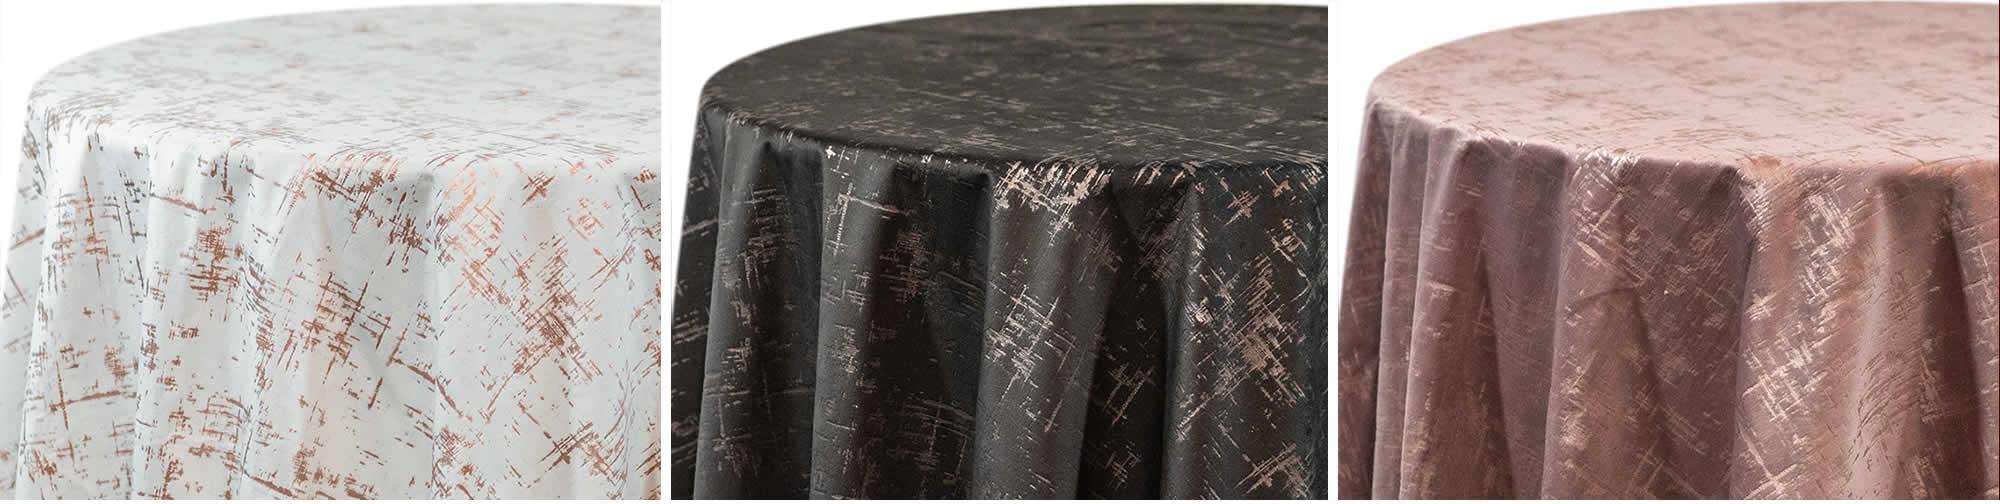 Magnificent Chair Cover Rentals Linen Rentals Chiavari Chair Rentals Lamtechconsult Wood Chair Design Ideas Lamtechconsultcom